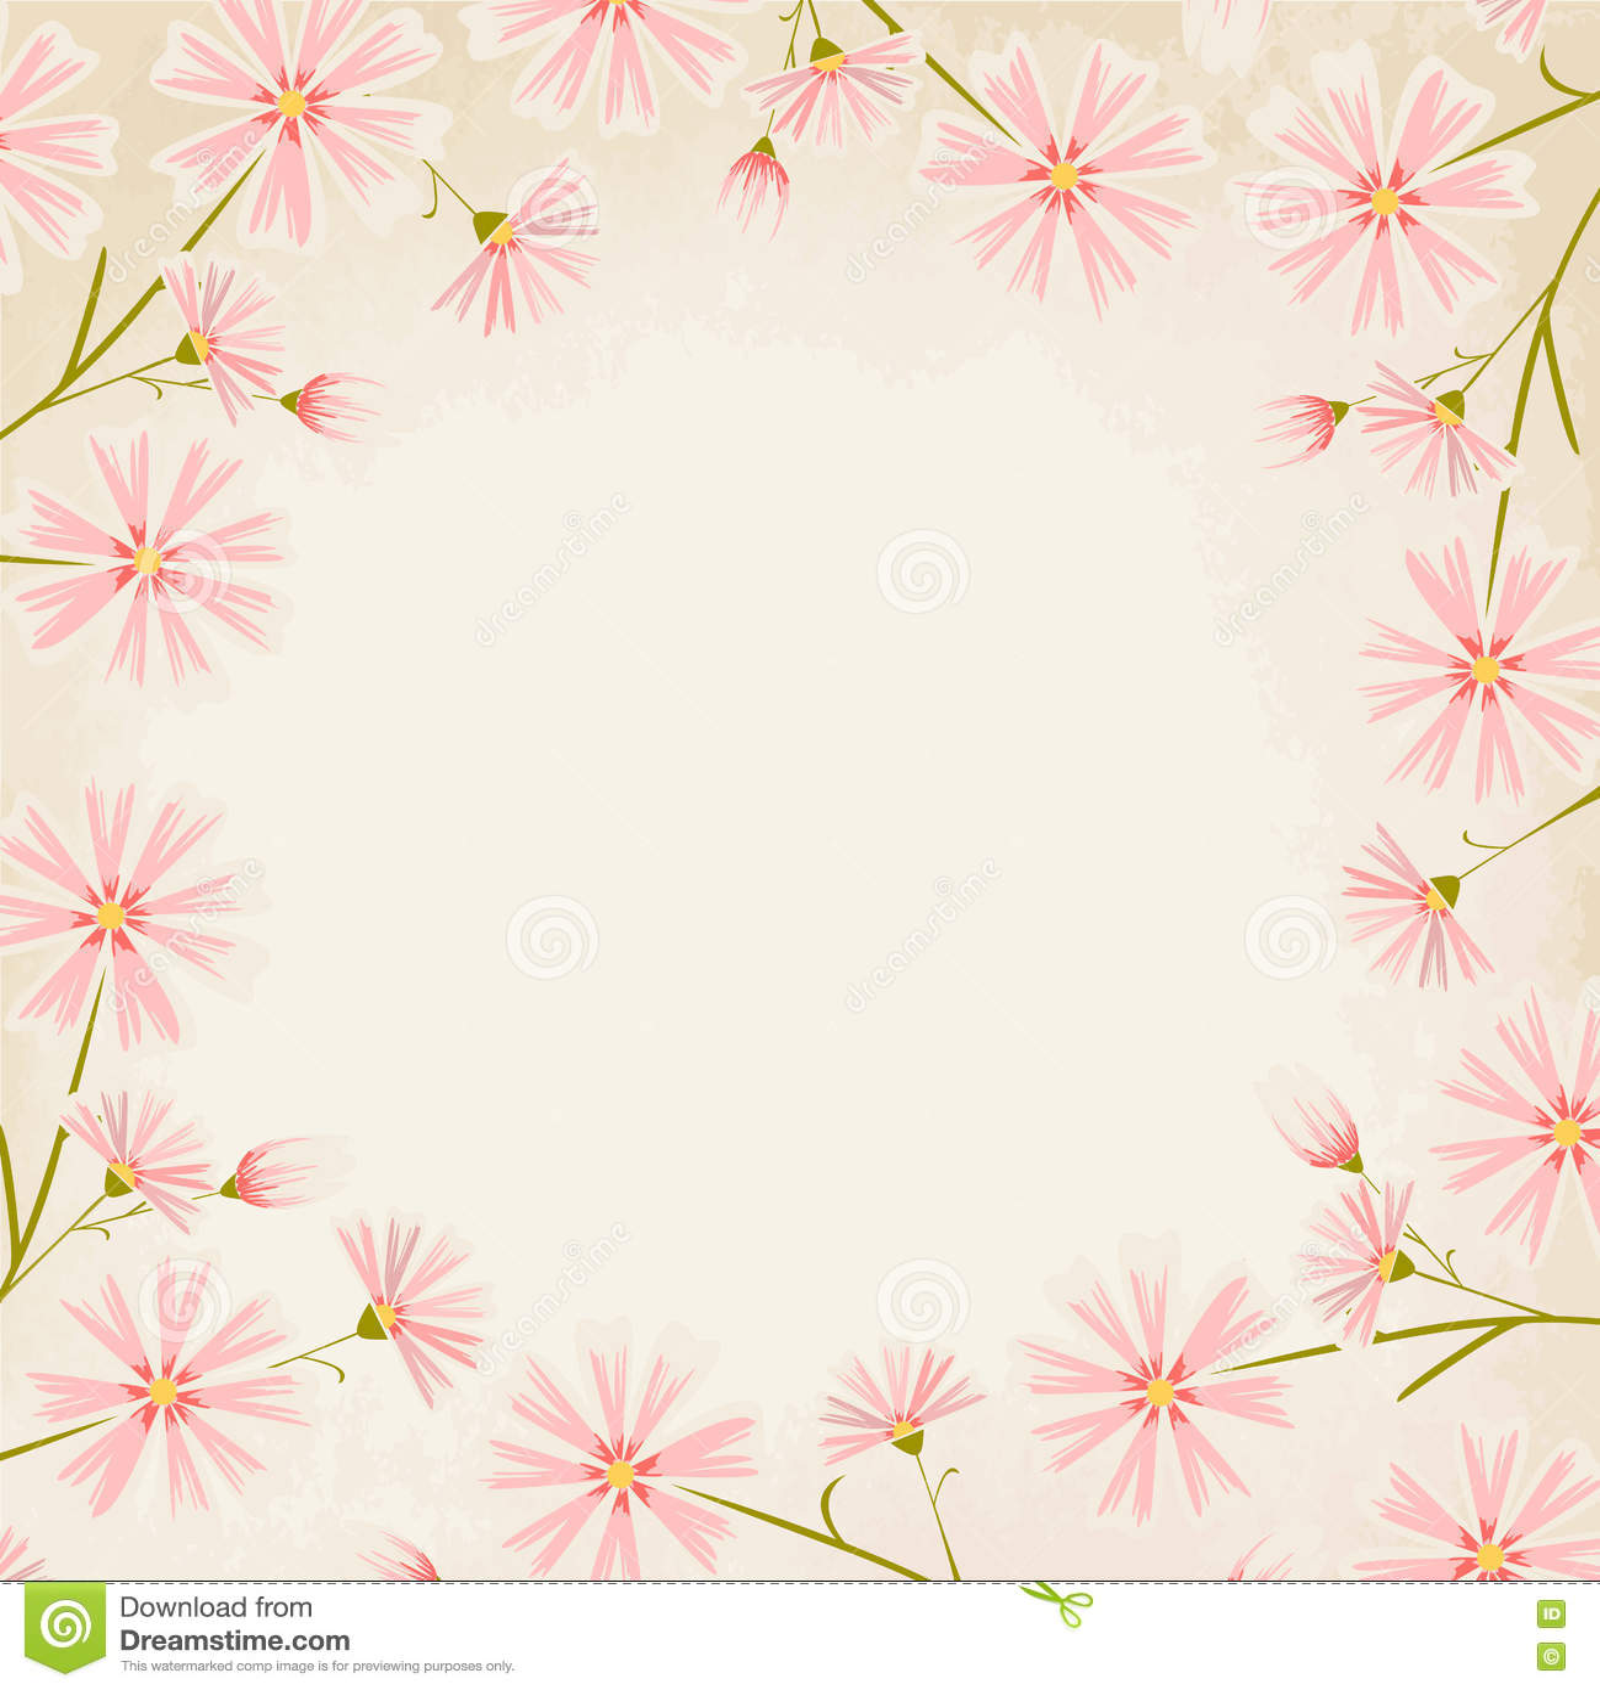 Pink Daisy Flowers Border Design Element Stock Vector Illustration